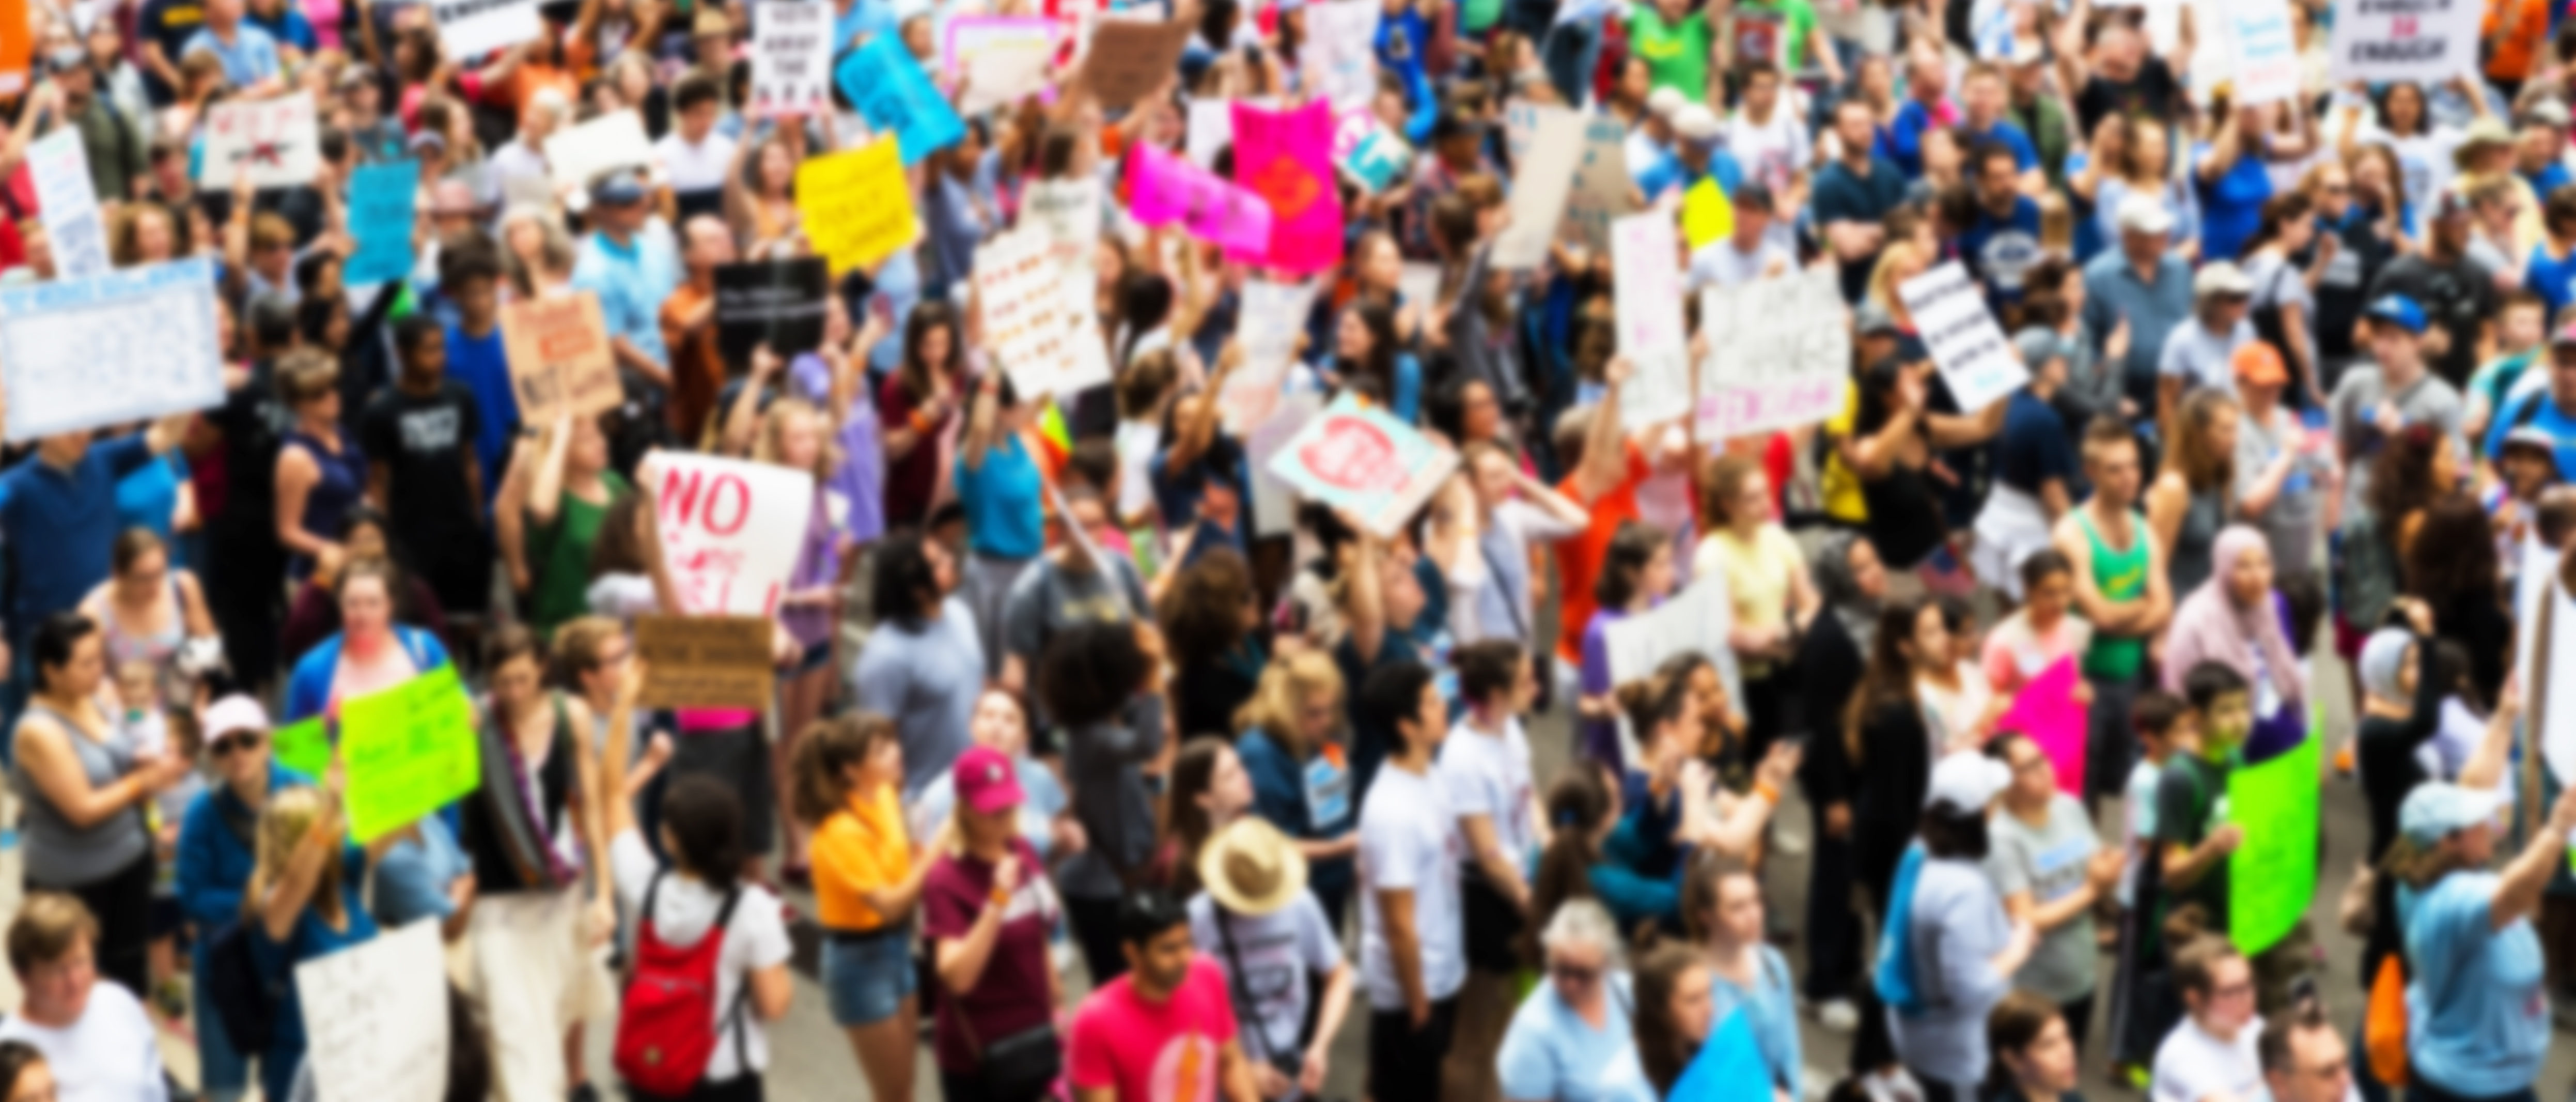 Huge crowd marching (Shutterstock/ michelmond)